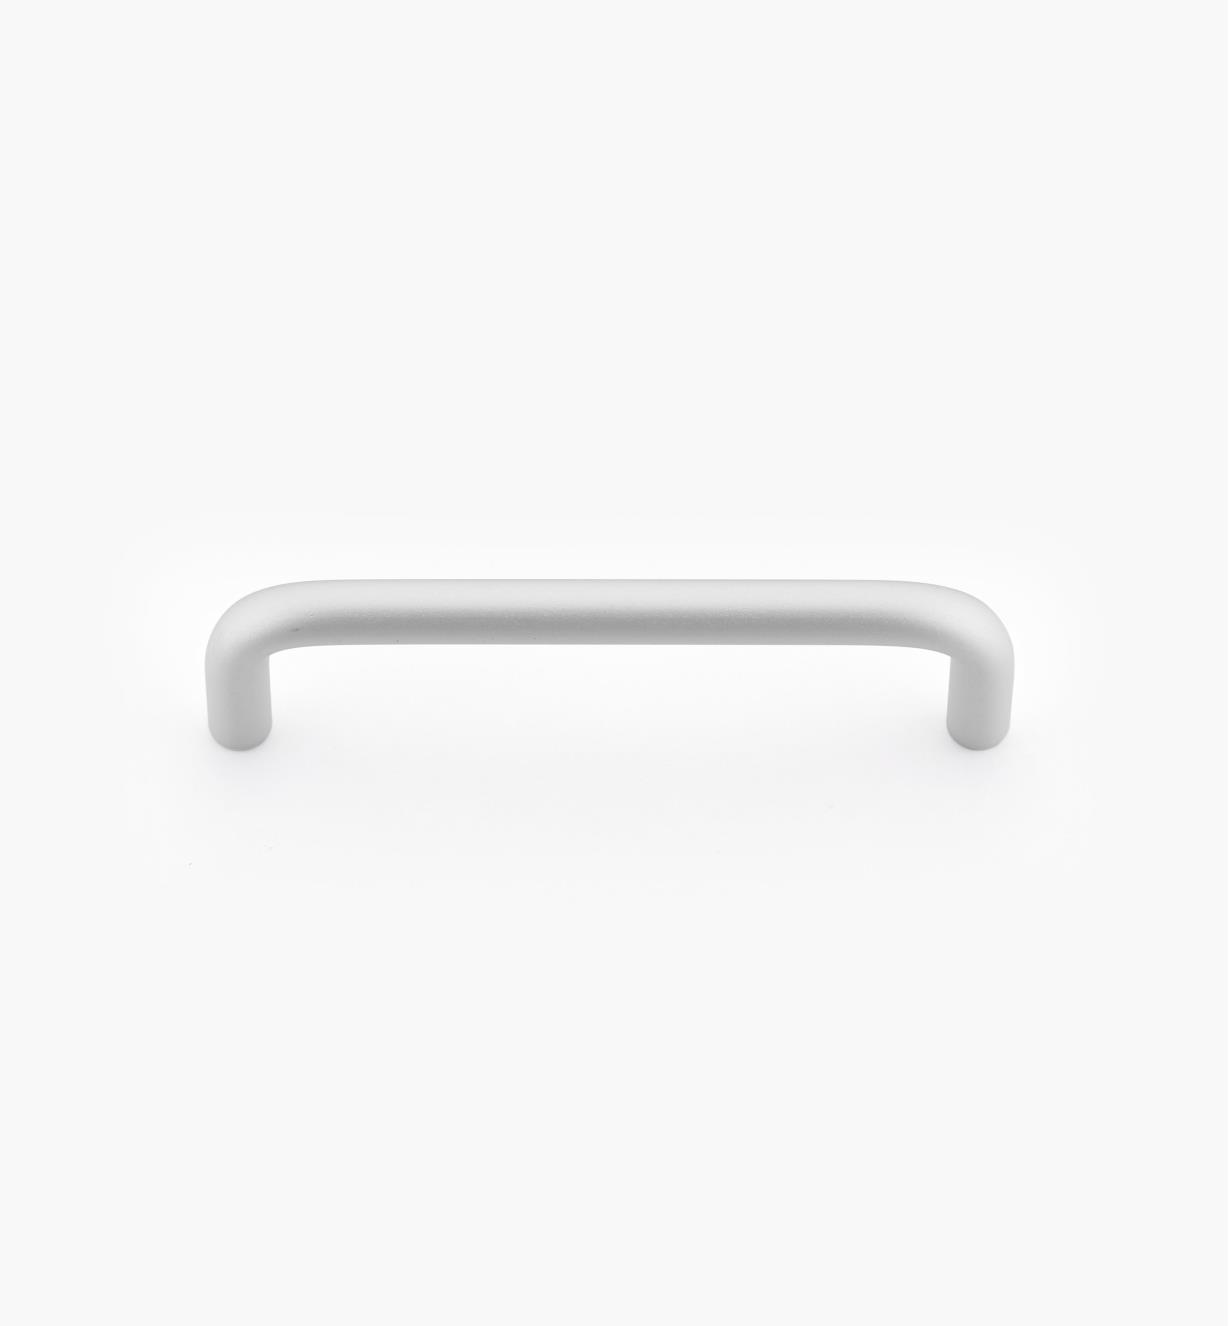 01W7602 - Poignée-fil moderne, aluminium satiné, 31/2po